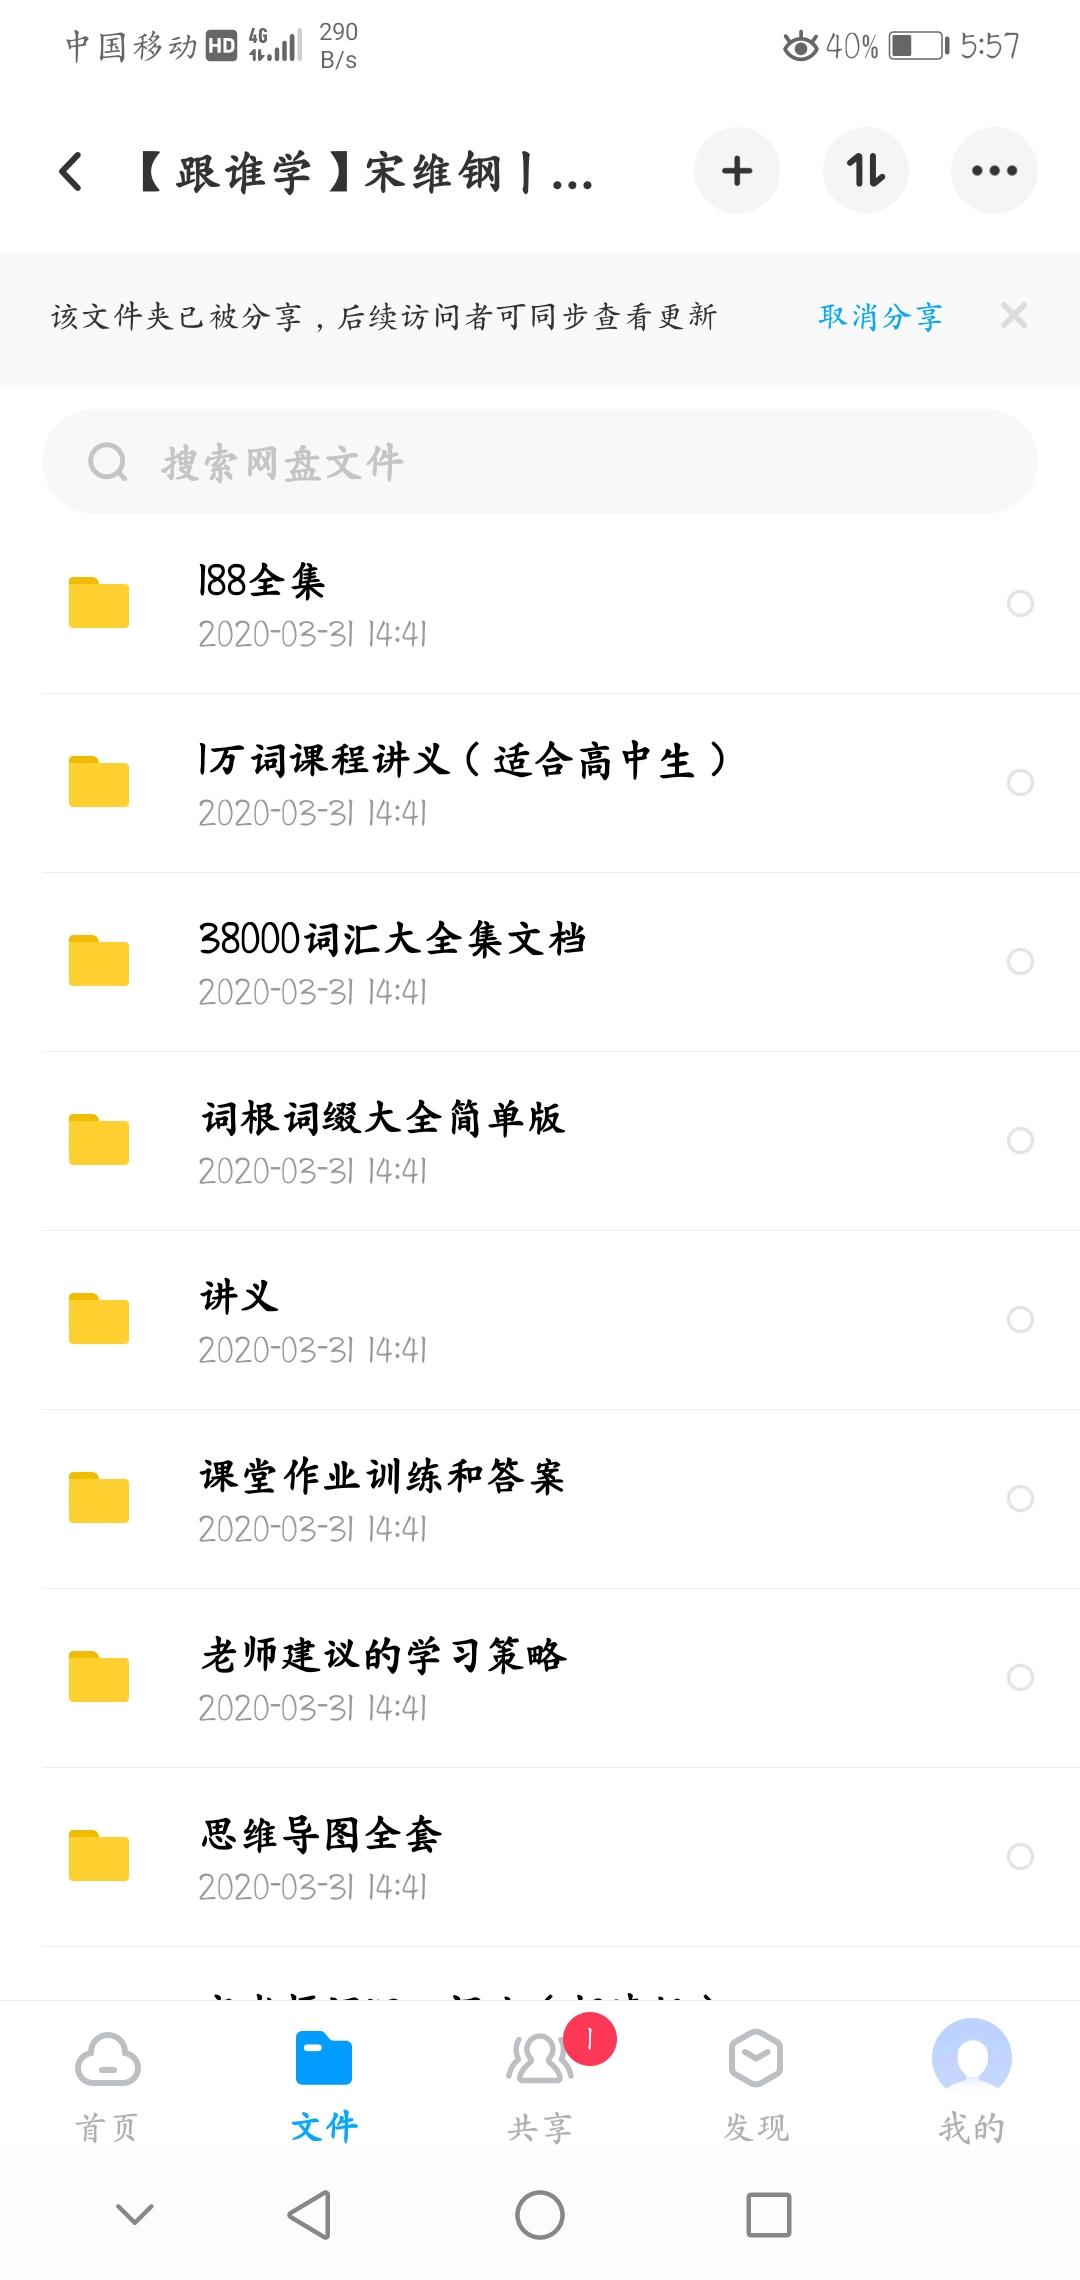 Screenshot_20200722_175752_com.baidu.netdisk